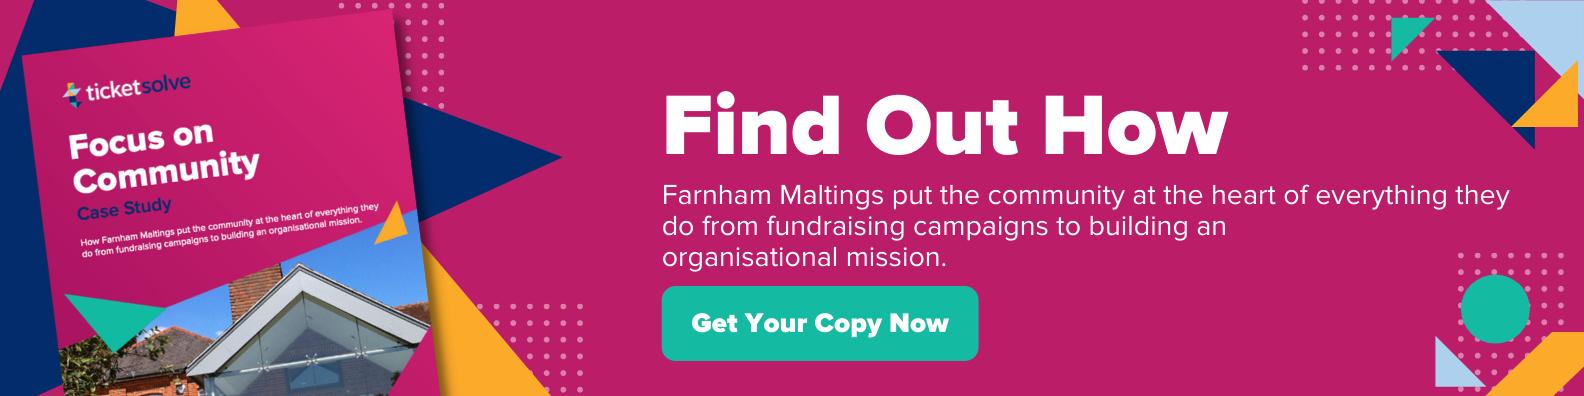 Farnham Maltings Case Study